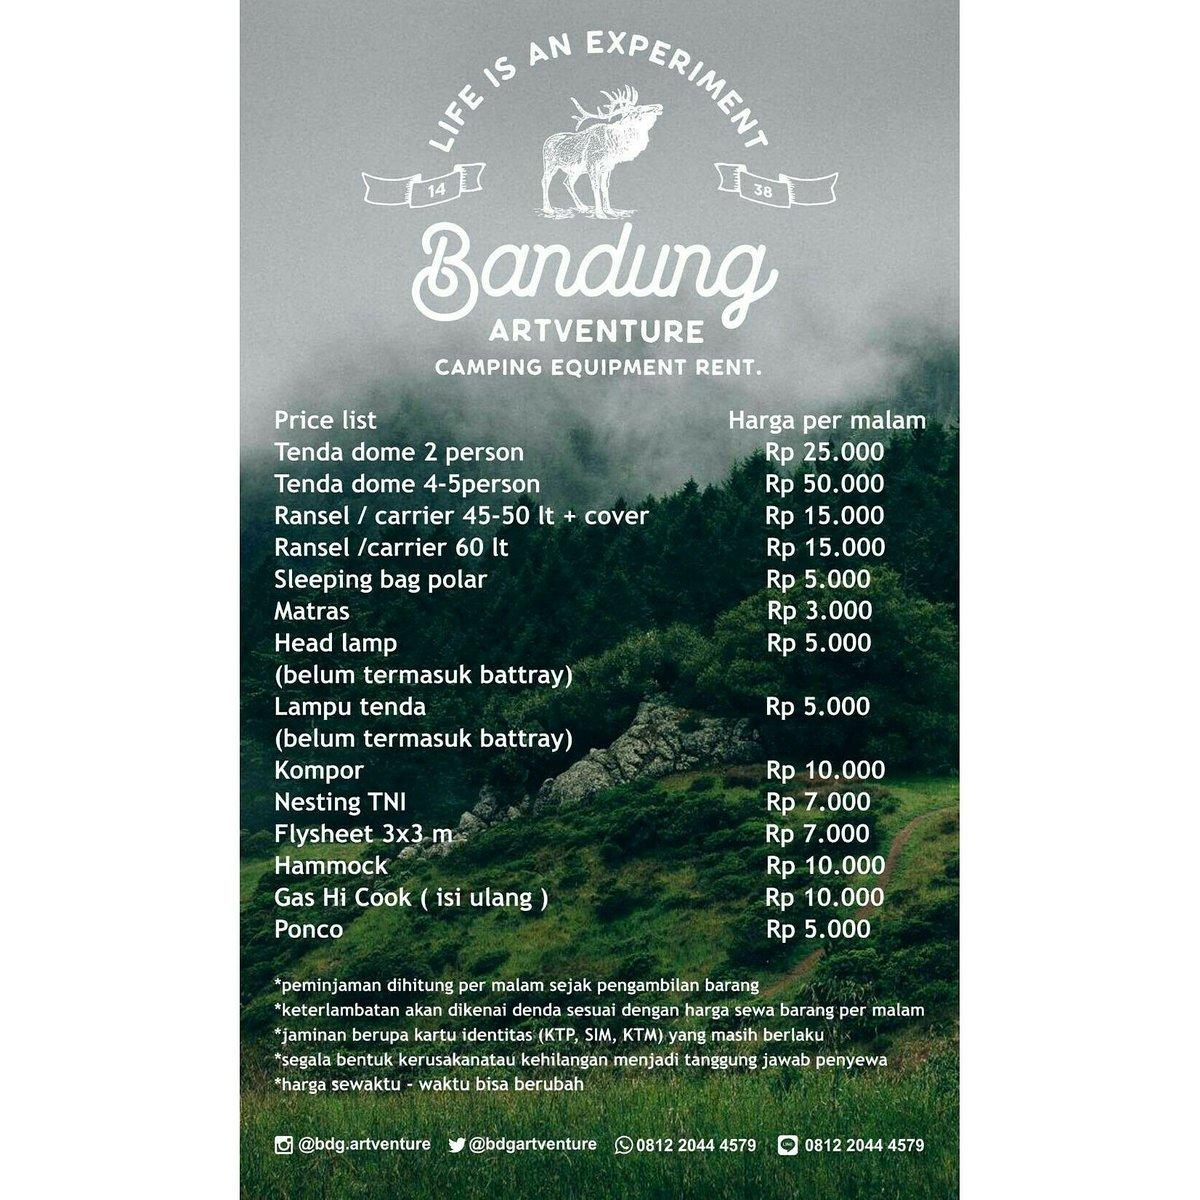 Sewa Alat Camping On Twitter Sewa Alat Camping Camping Equipment Rent Rental Camp Alat Outdoor Cisitu Baru No20 Simpang Dago Bandung Line Wa 081220444579 Https T Co 3mldivnq3f